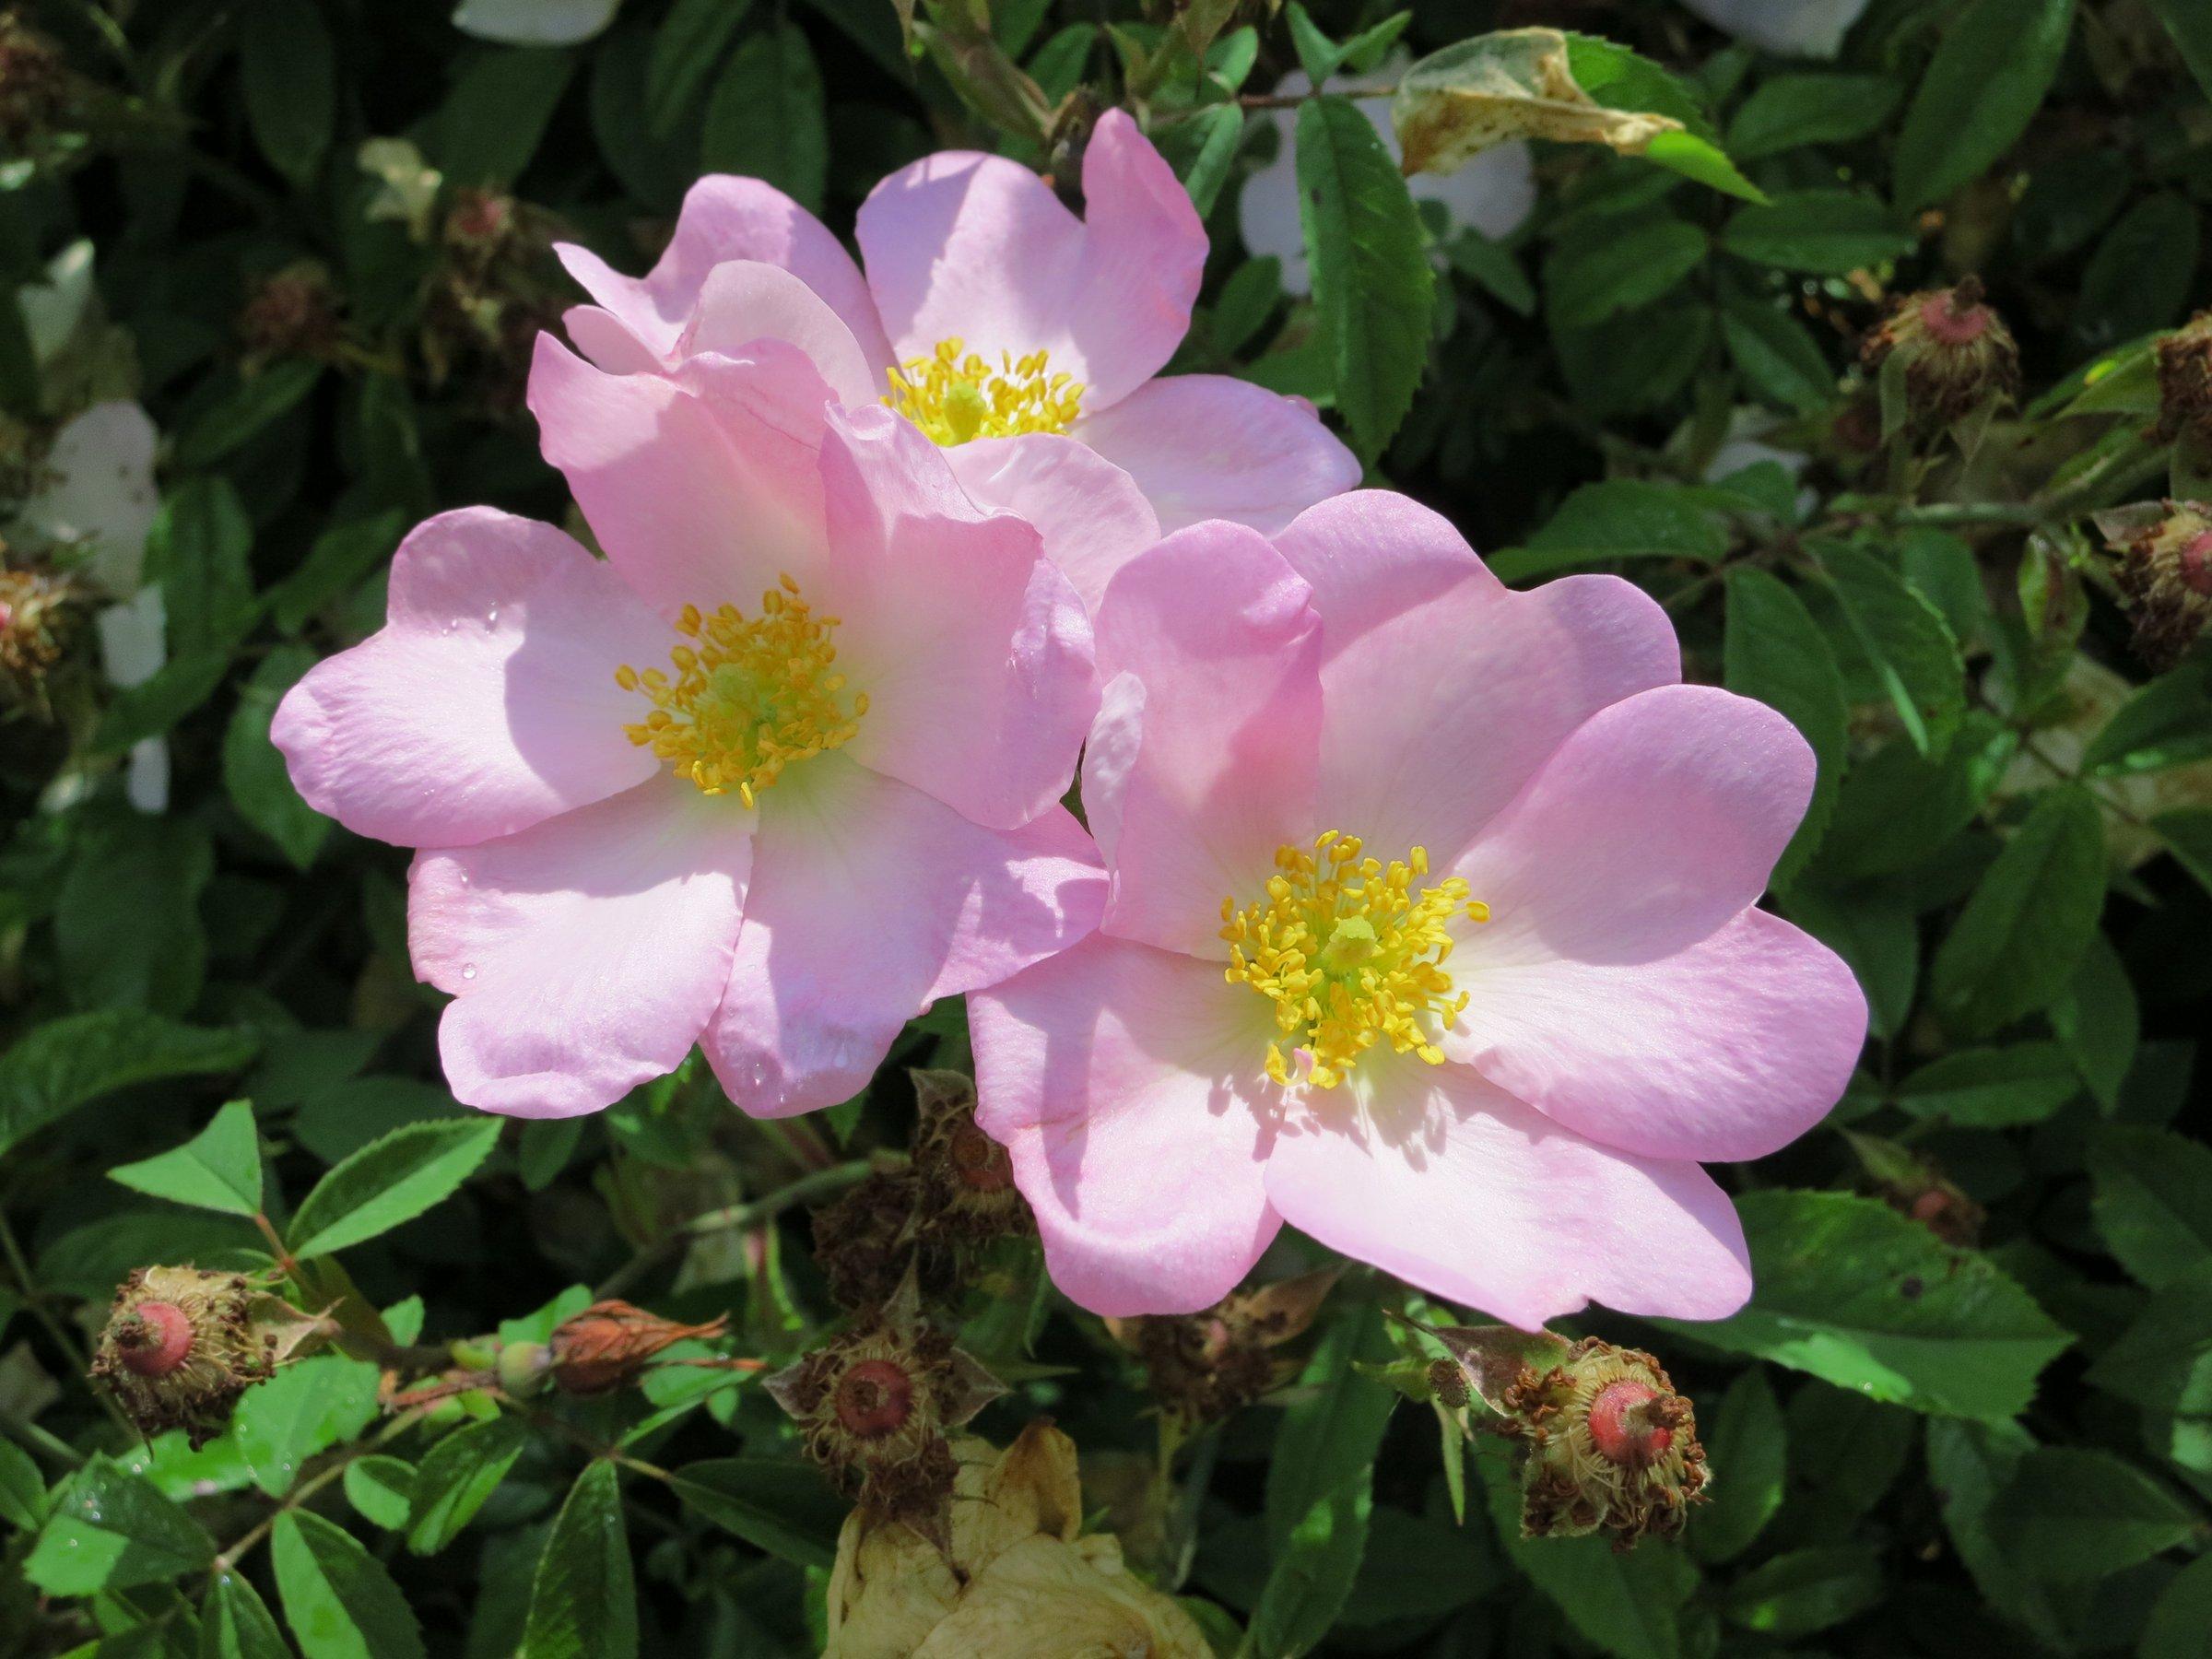 Rosa x polliniana. (Blassrote Kriechrose)